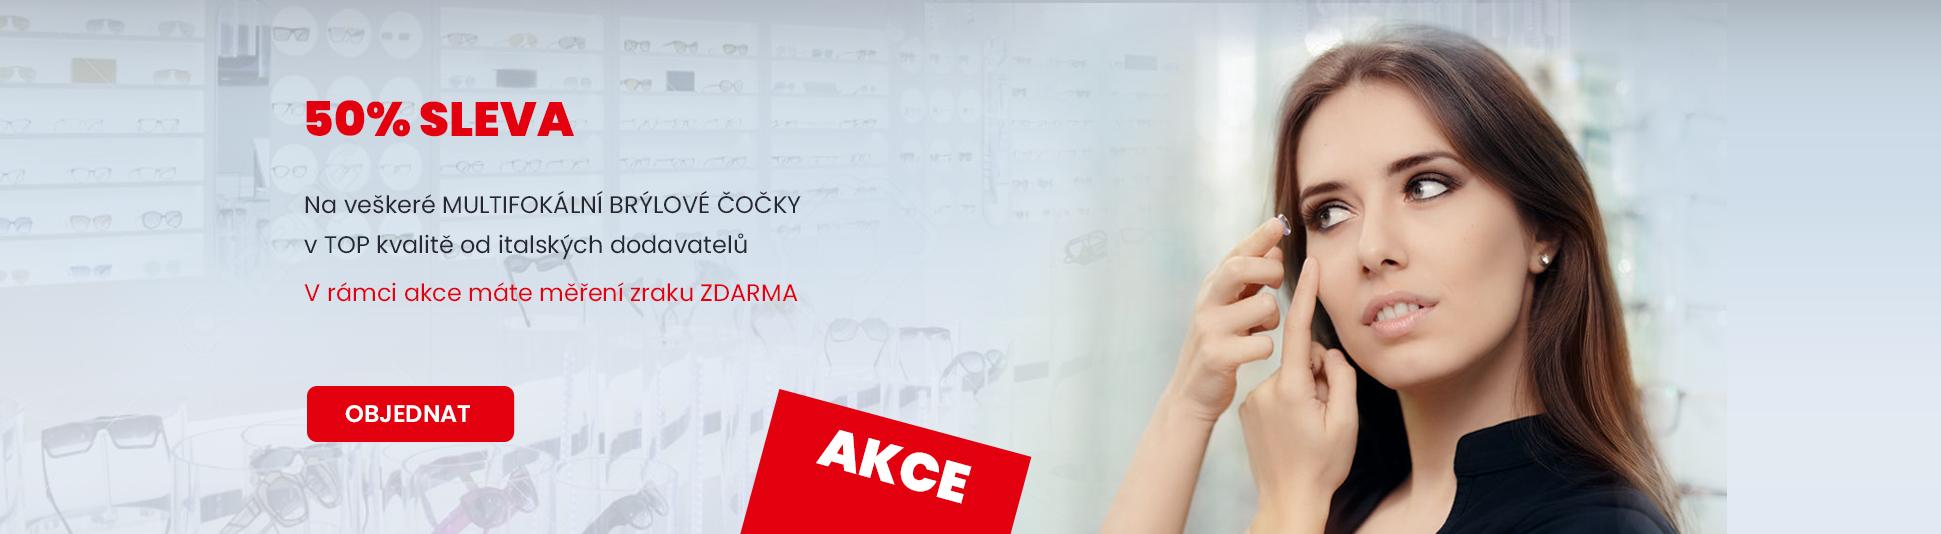 banner_akce_